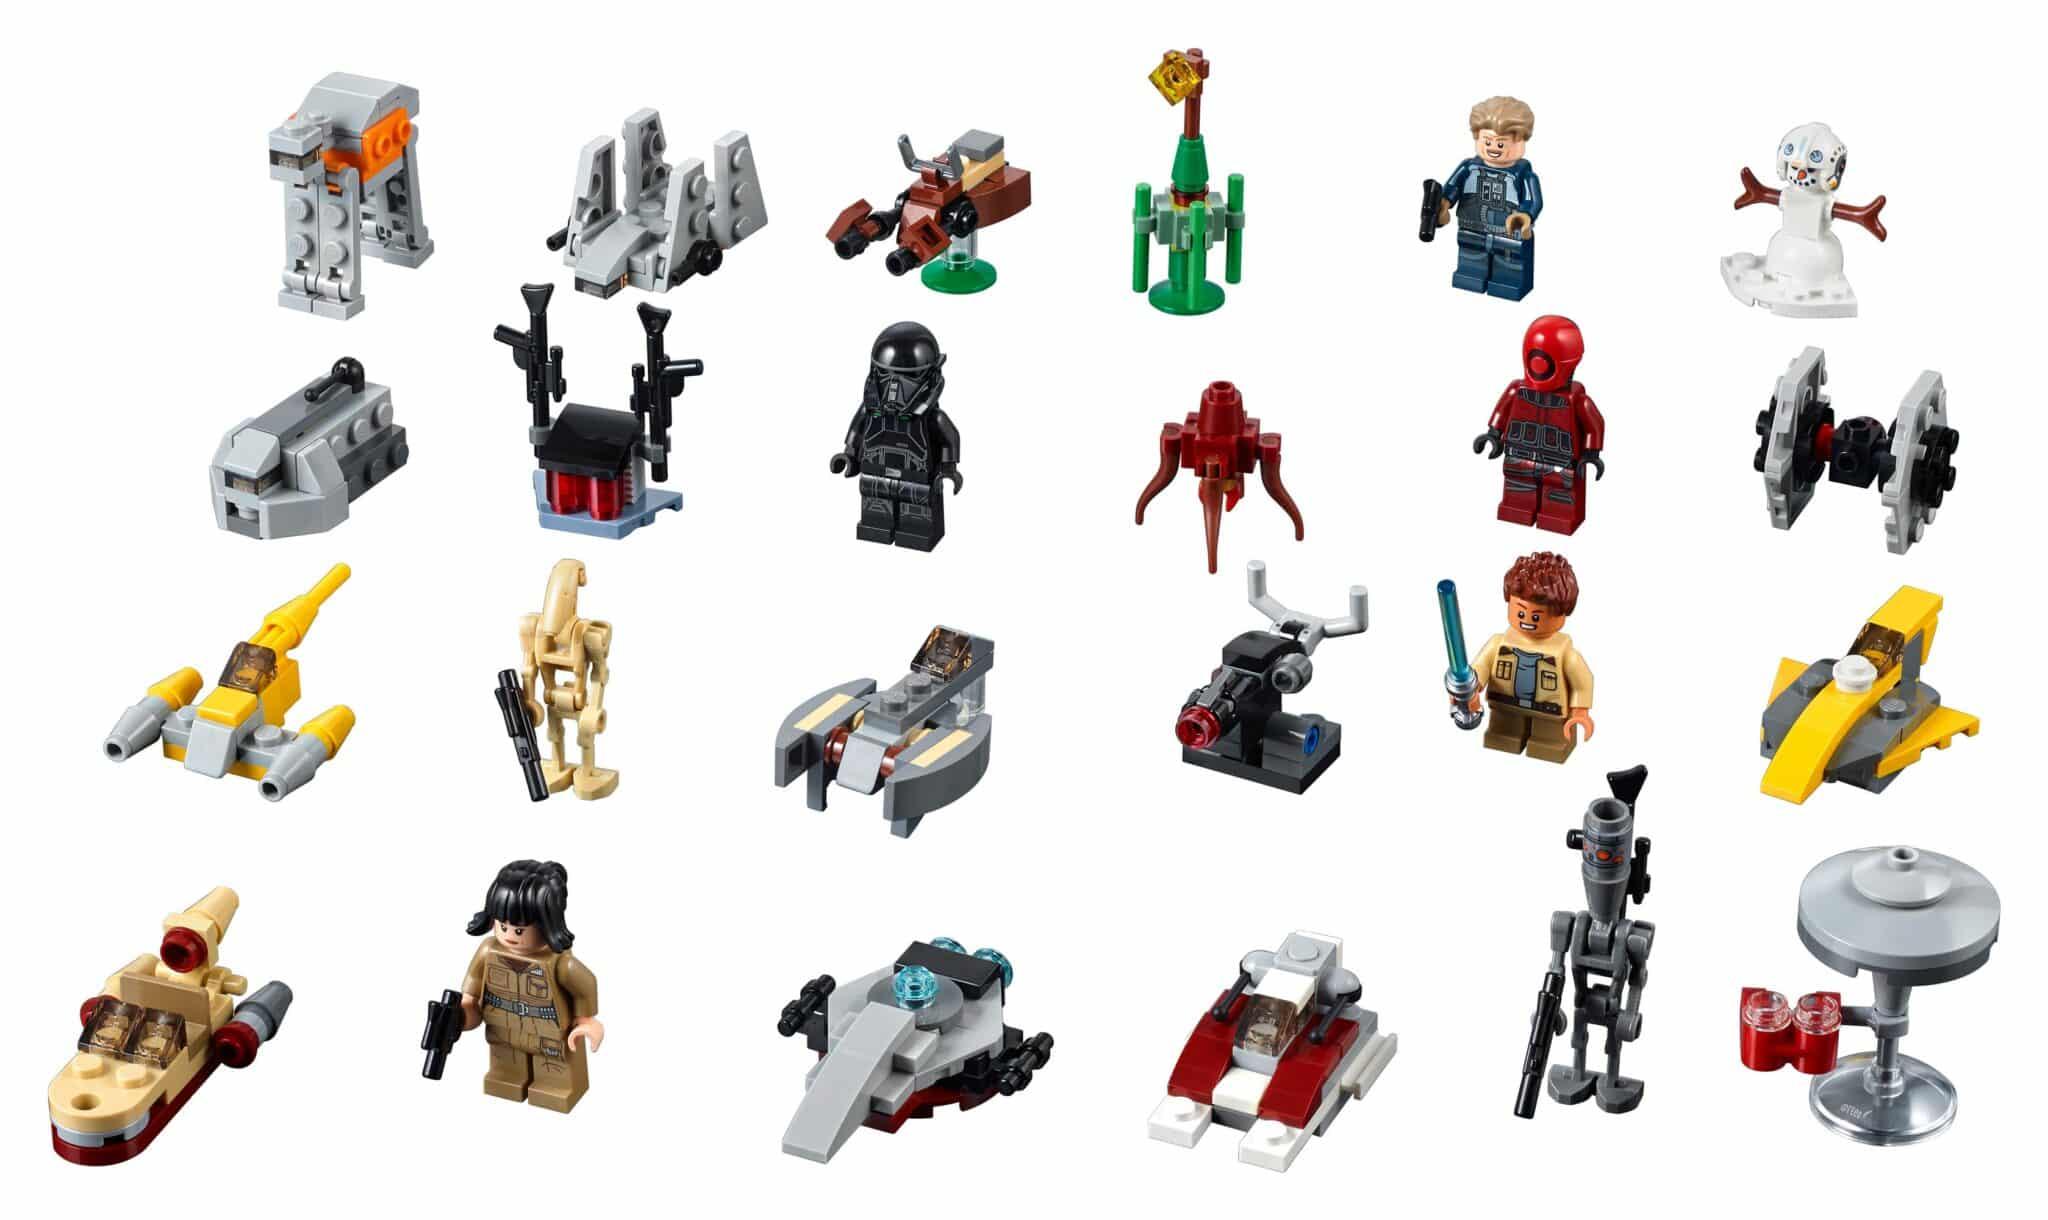 Lego Star Wars Advent Calendar 2018 (75213) figures